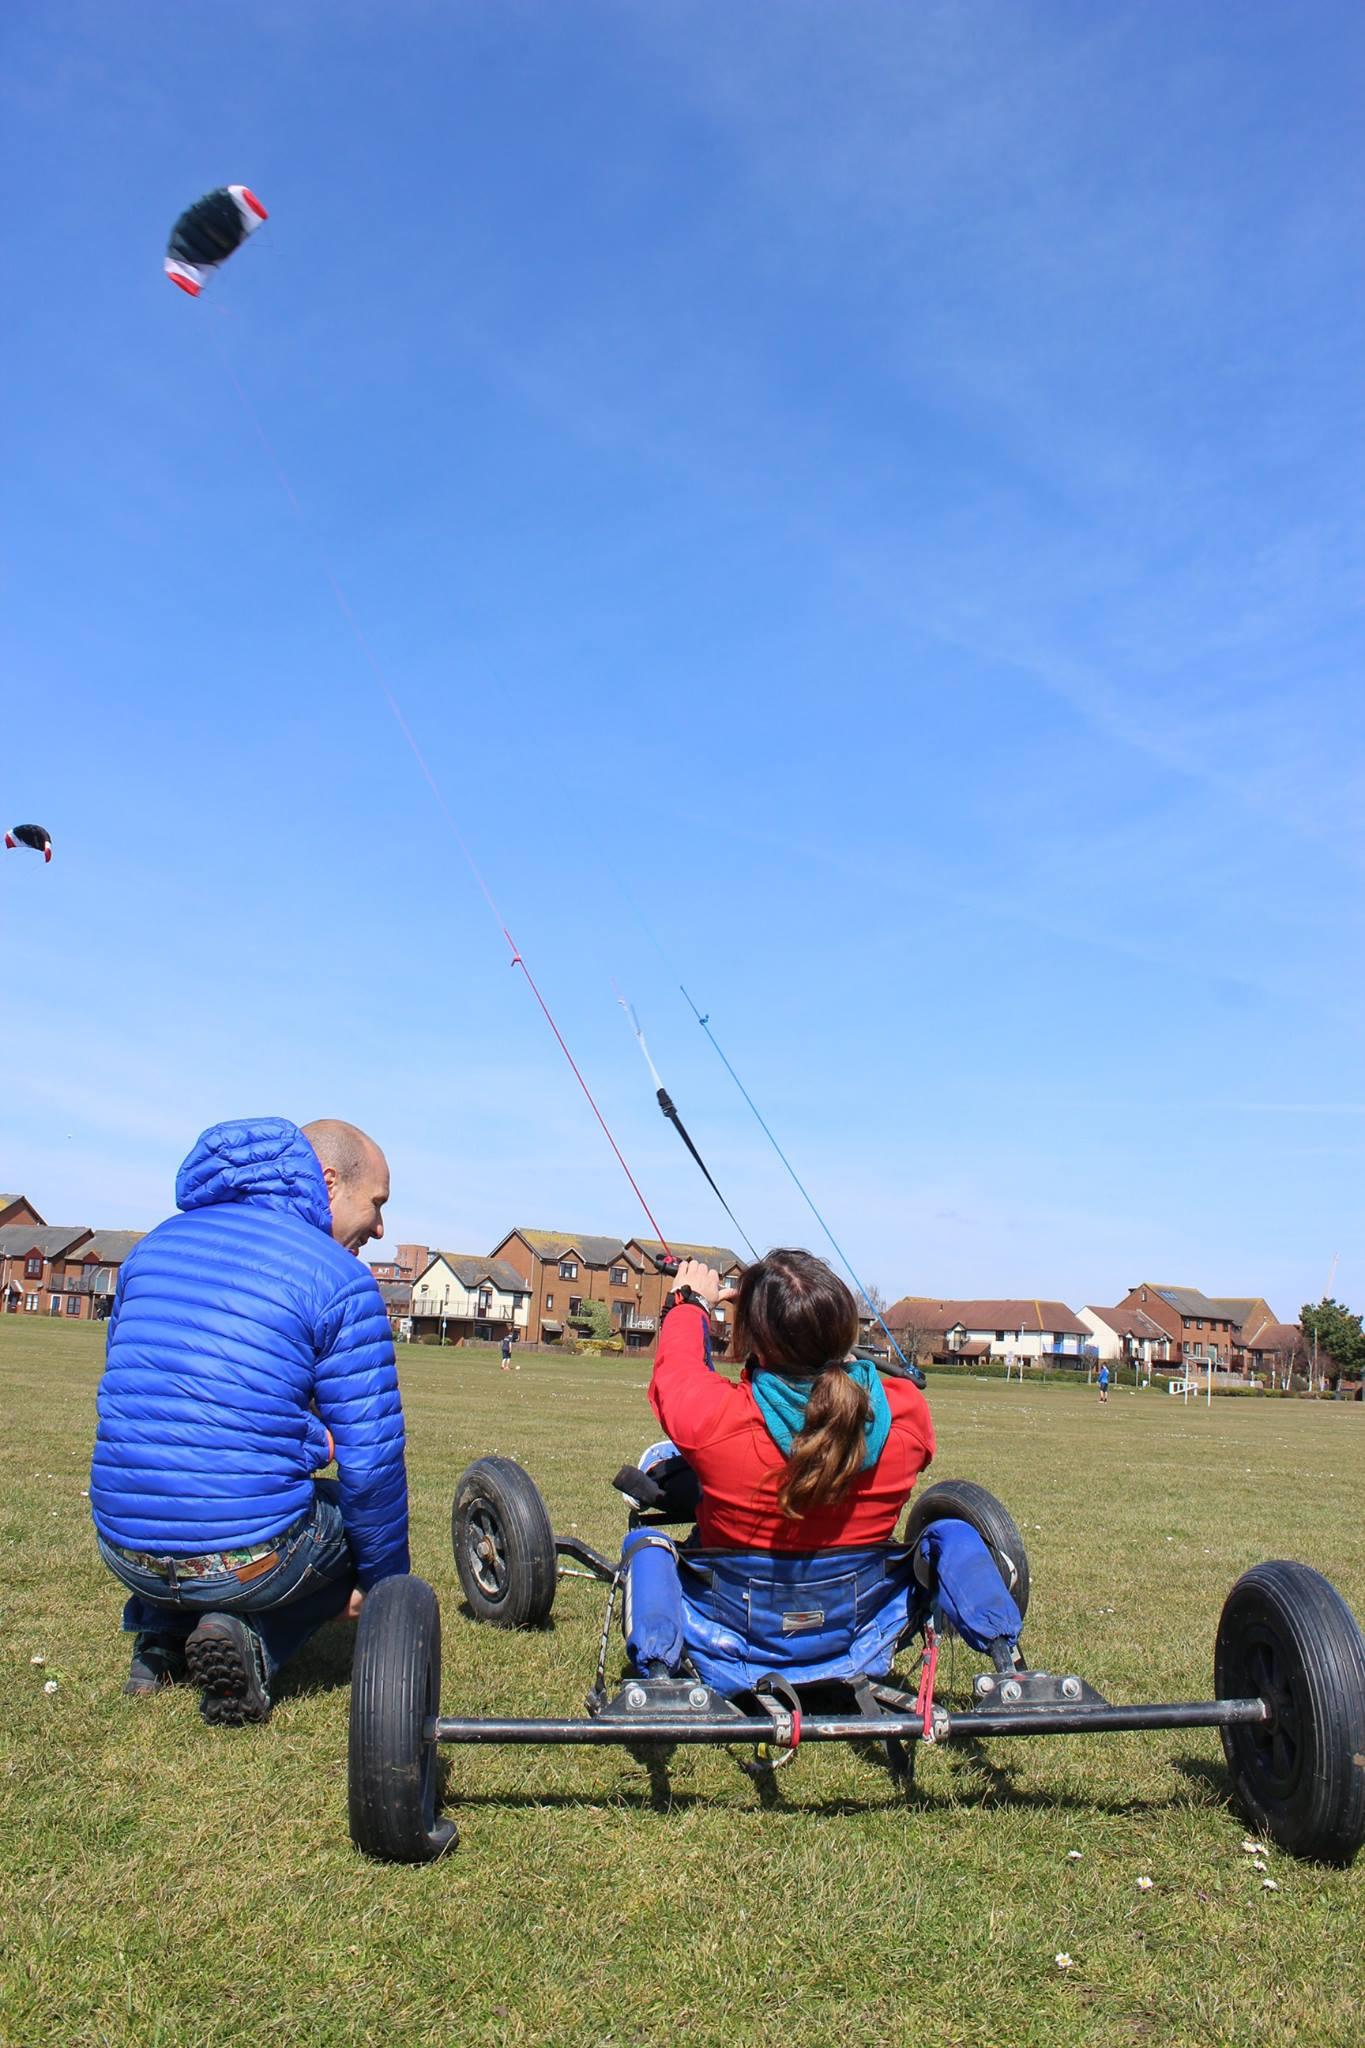 Respecting the kite!